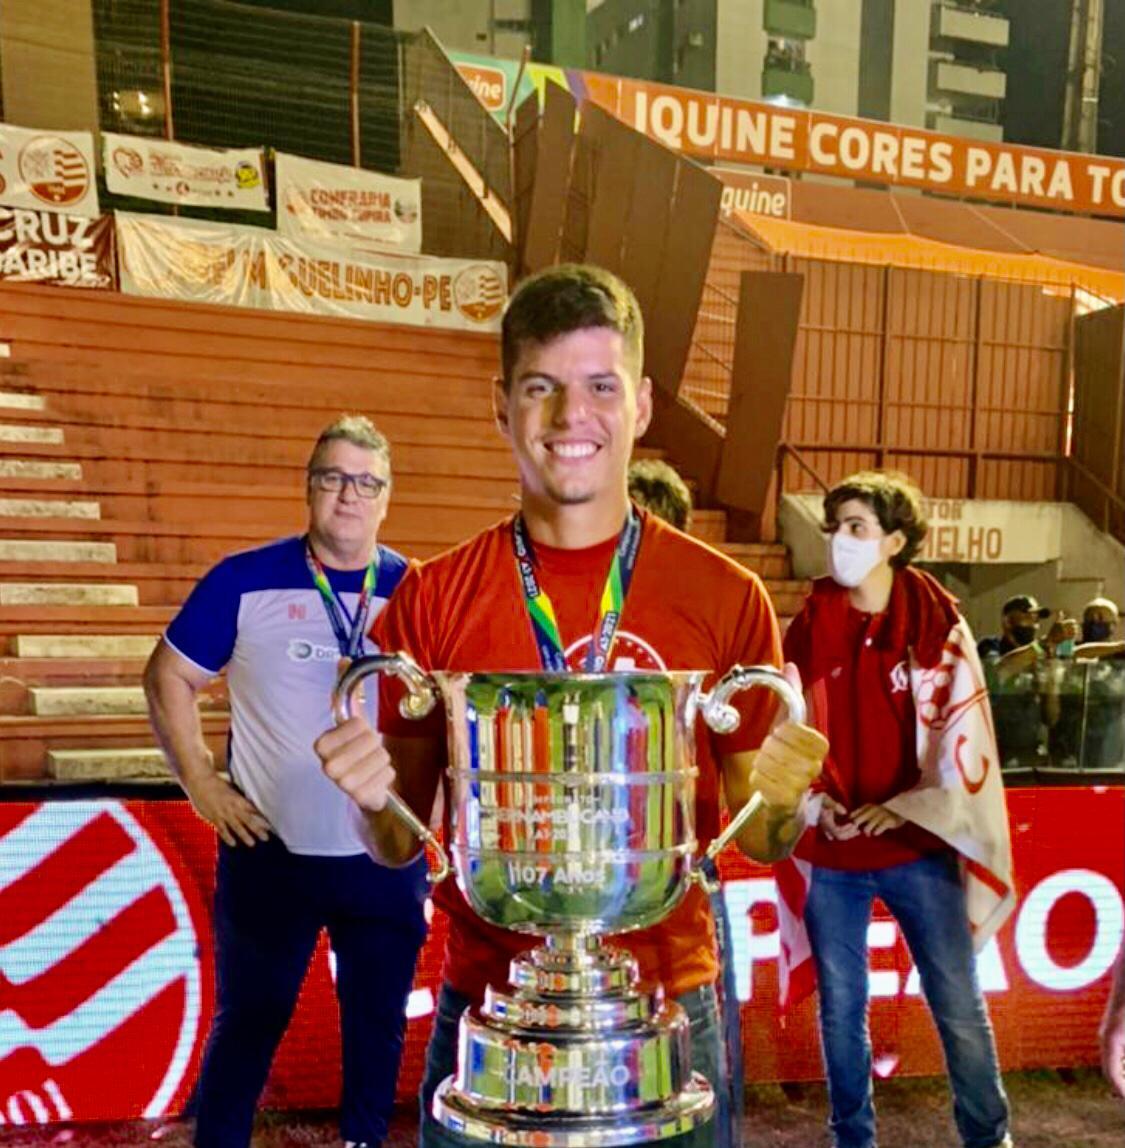 WhatsApp Image 2021 05 24 at 15.15.23 1 - NÁUTICO CAMPEÃO! Jogador paraibano conquista o campeonato pernambucano de 2021